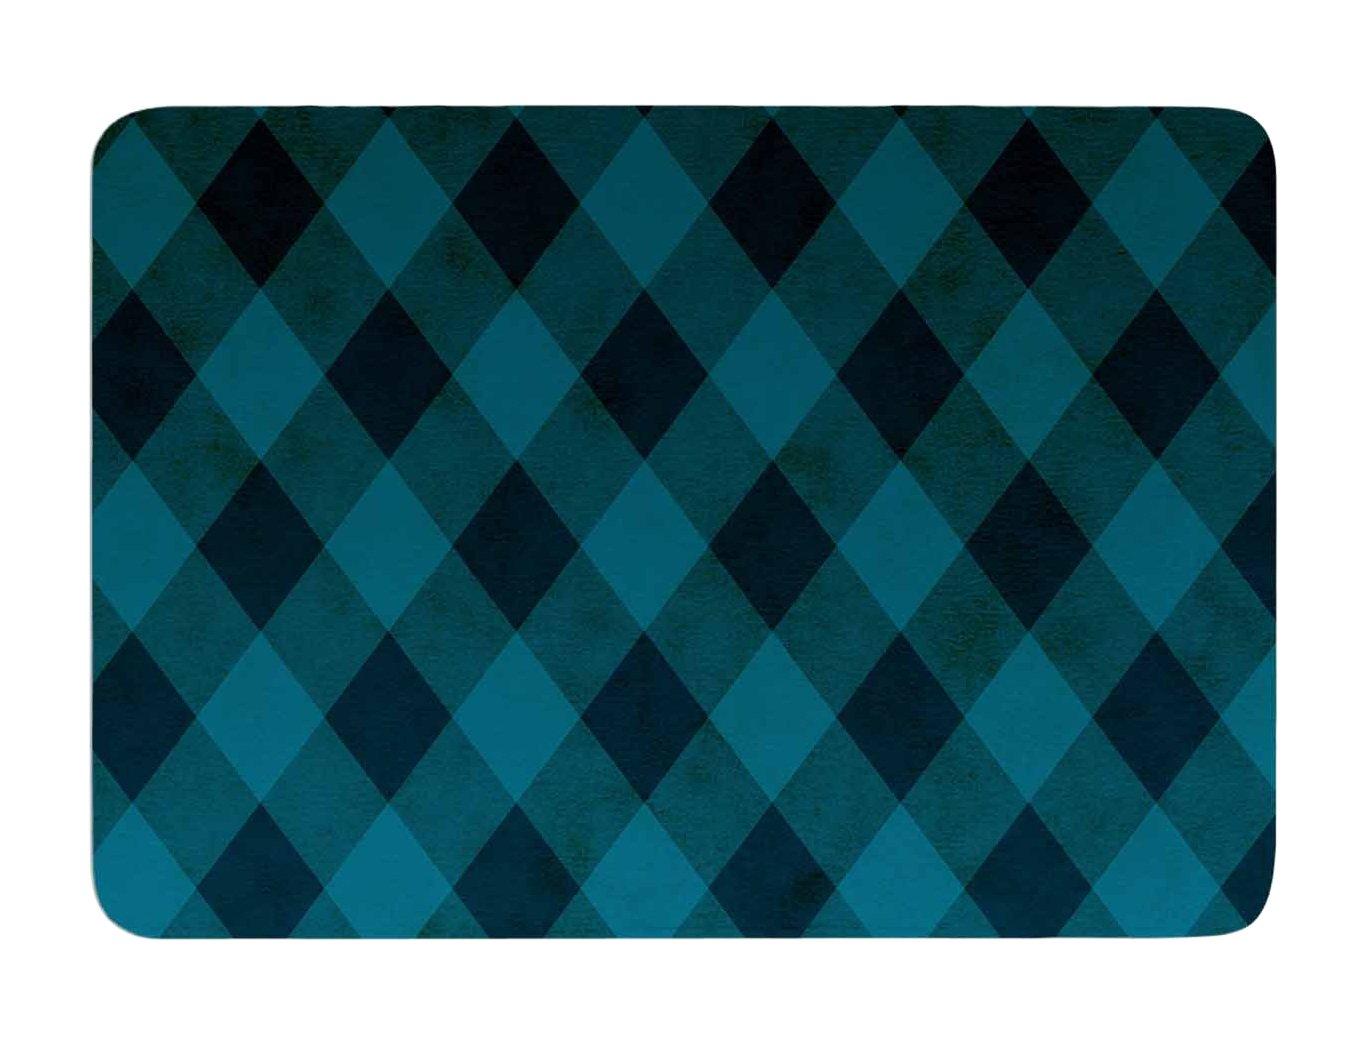 24 by 36-Inch Kess InHouse Matt Eklund deep Current Blue Pattern Memory Foam Bath Mat 24 X 36